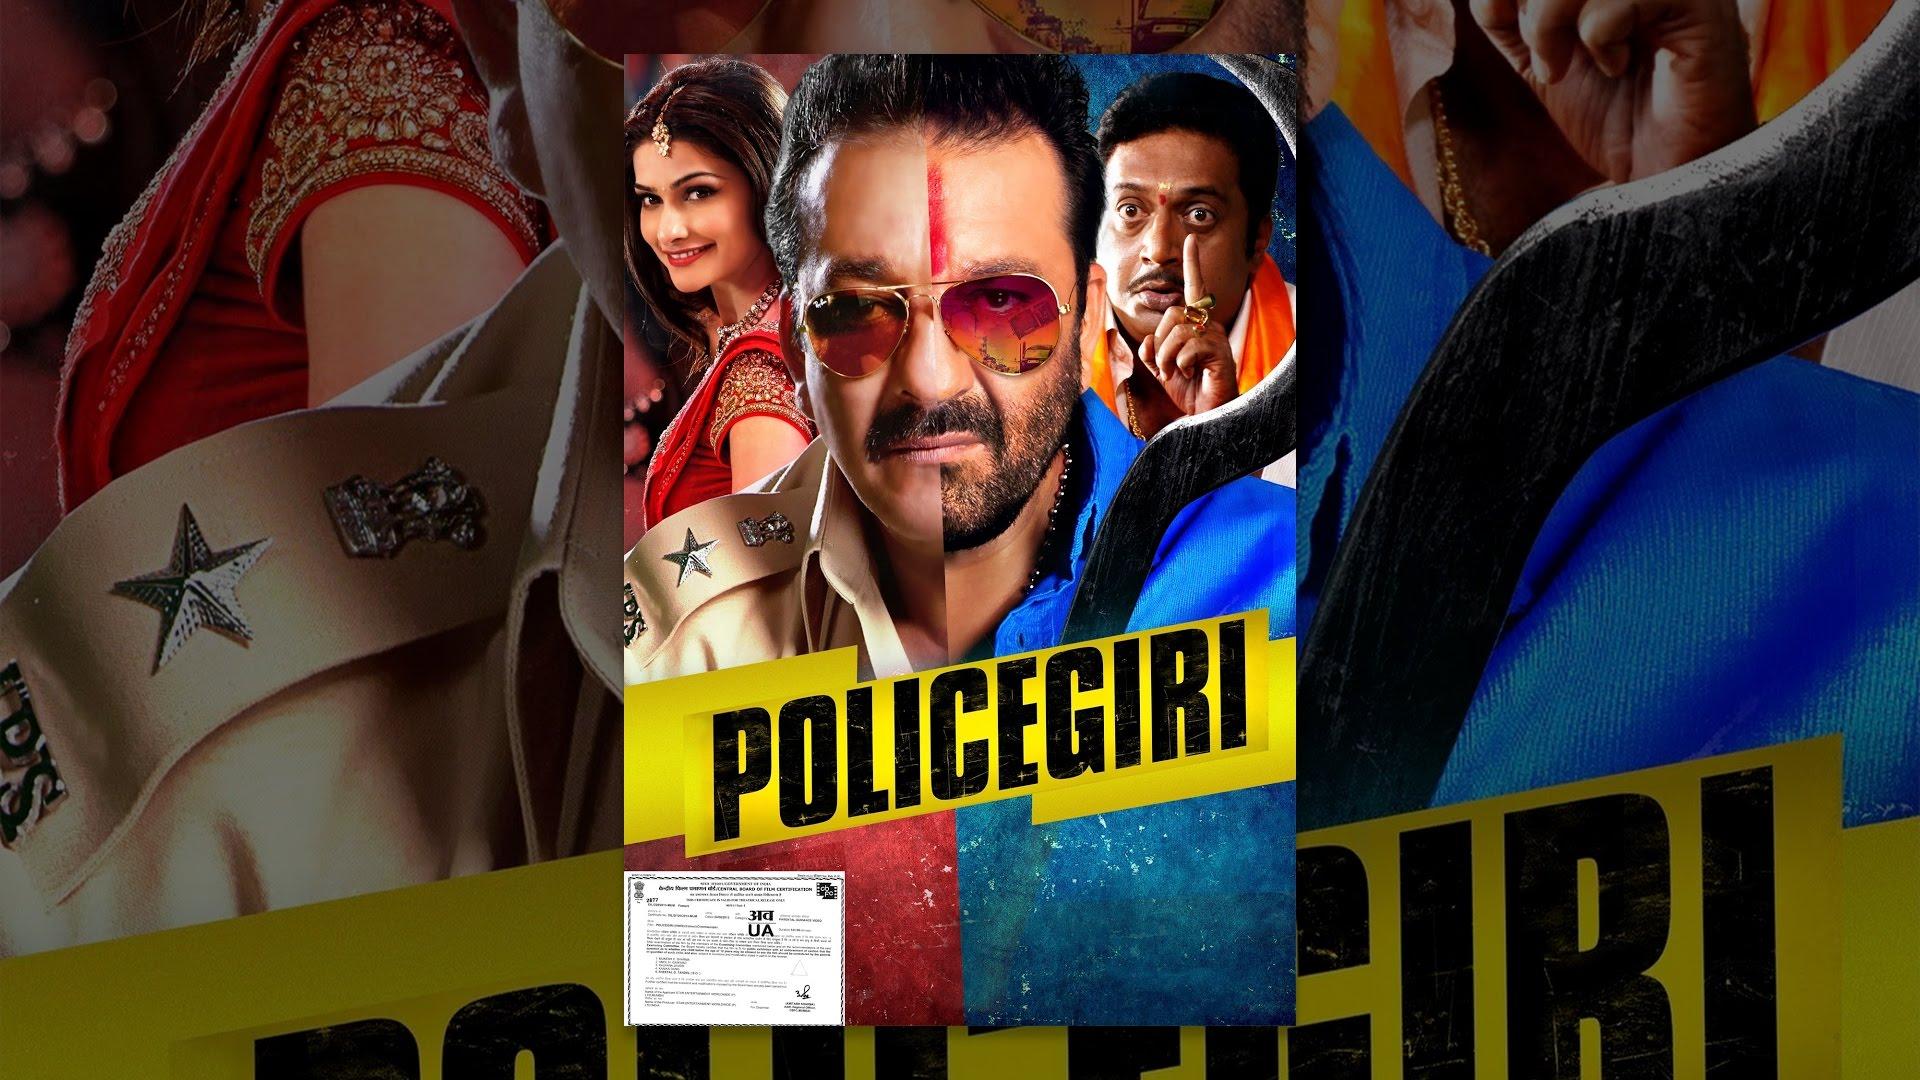 Policegiri Full Action HD Hindi Movie 2013 Sanjay Dutt, Prakash Raj